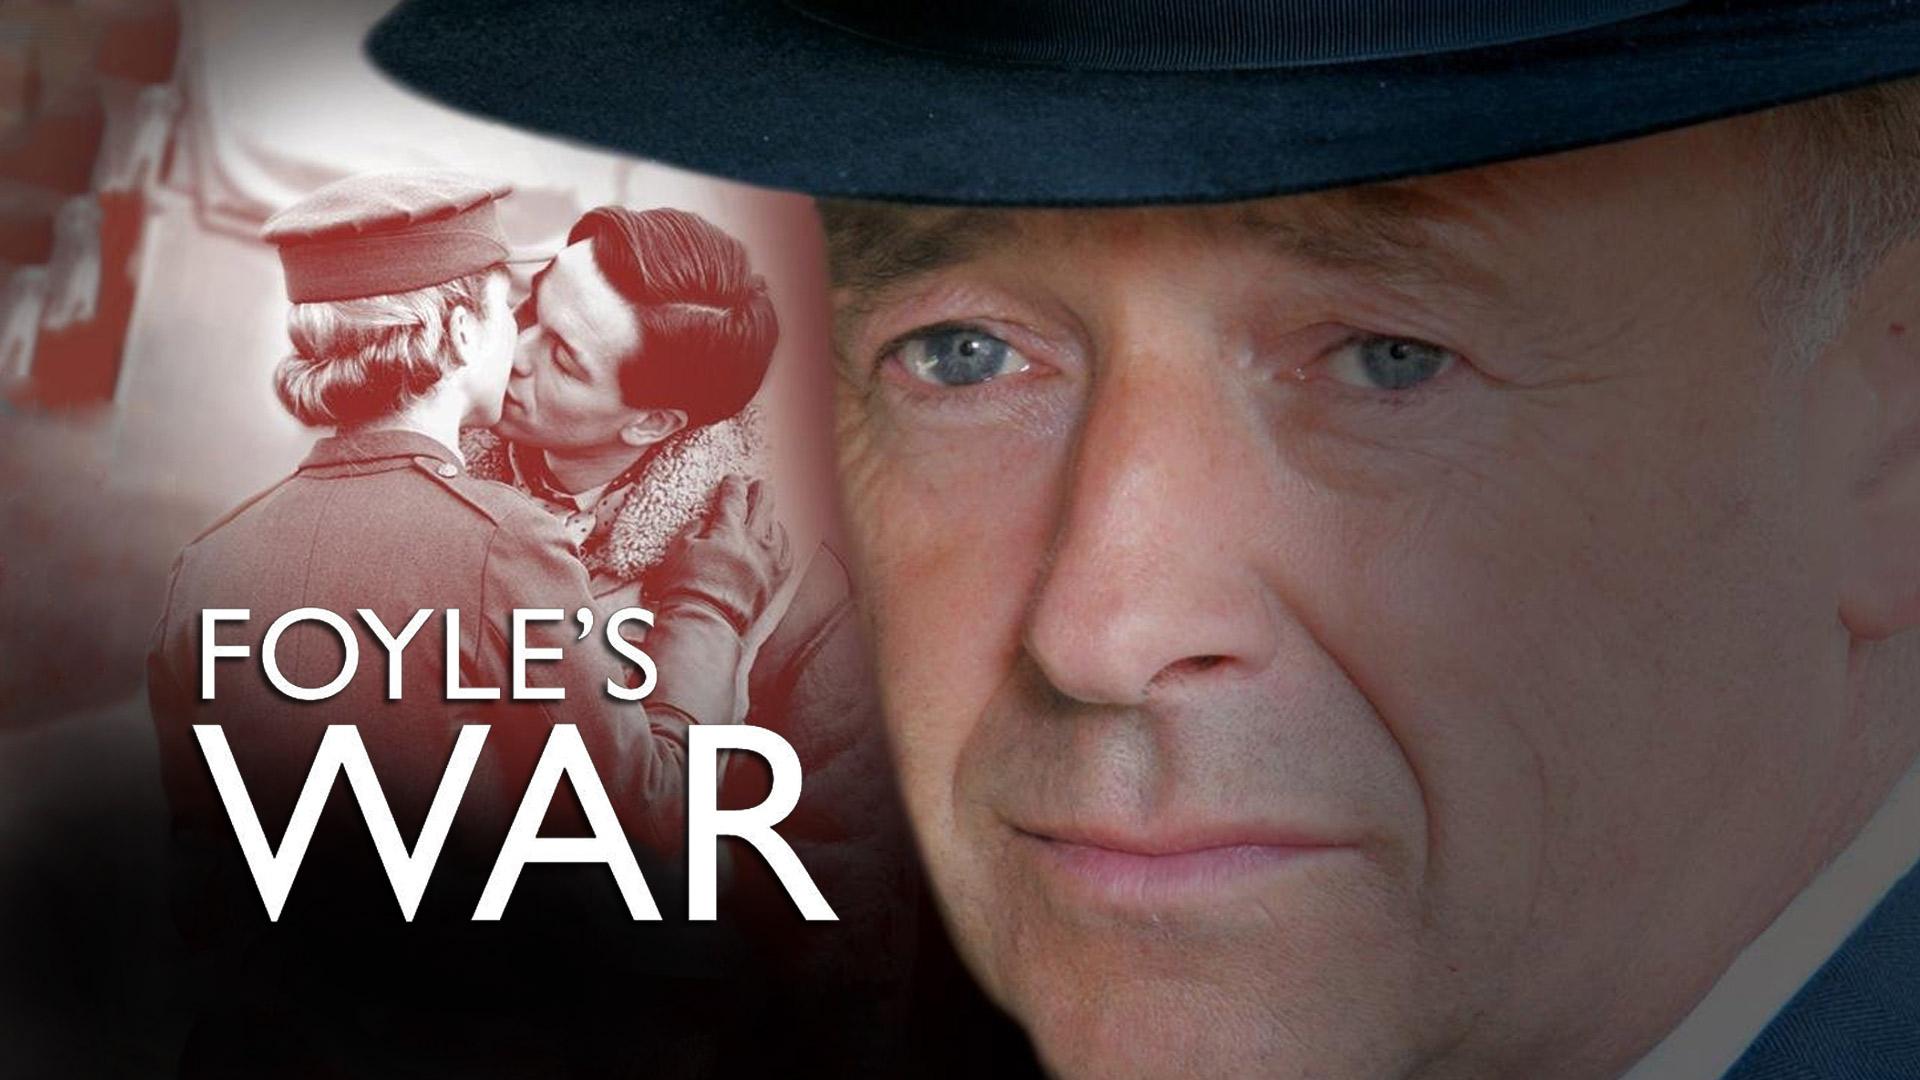 Foyle's War, Series 3